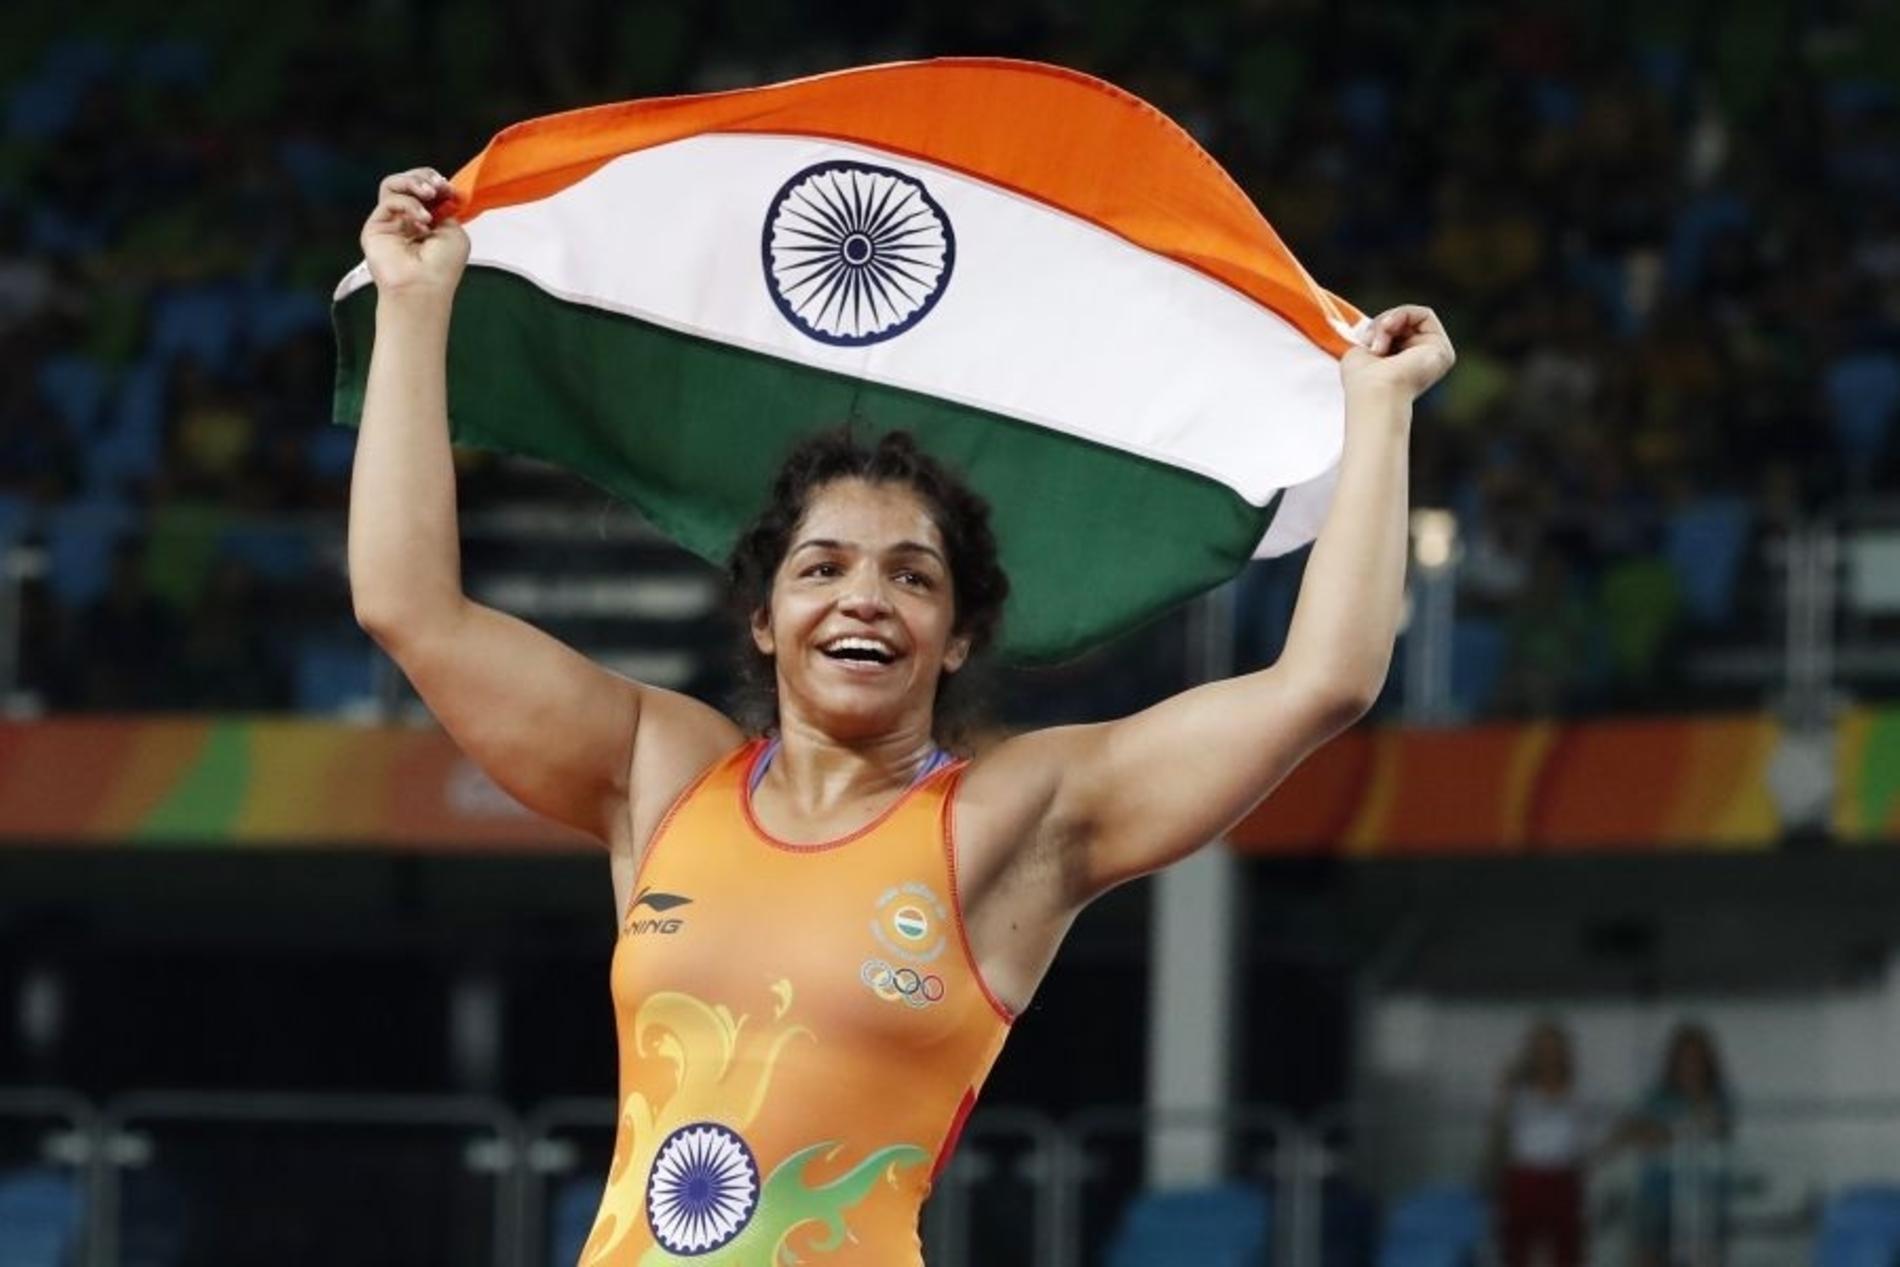 Photo of Sakshi Malik: The Opener for India in Rio Olympics